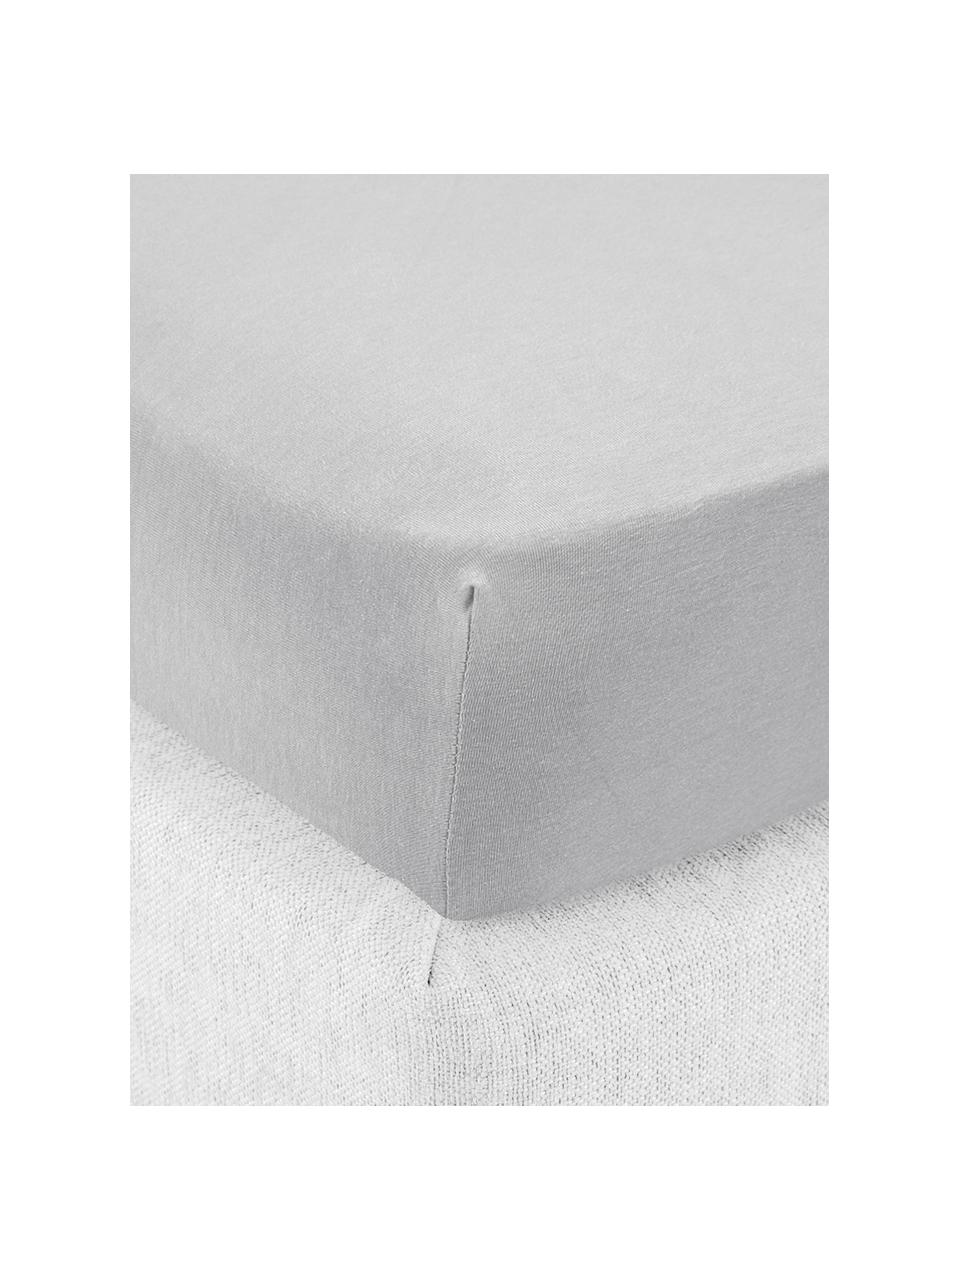 Lenzuolo con angoli in jersey-elastan grigio chiaro Lara, 95% cotone, 5% elastan, Grigio chiaro, Larg. 180 x Lung. 200 cm